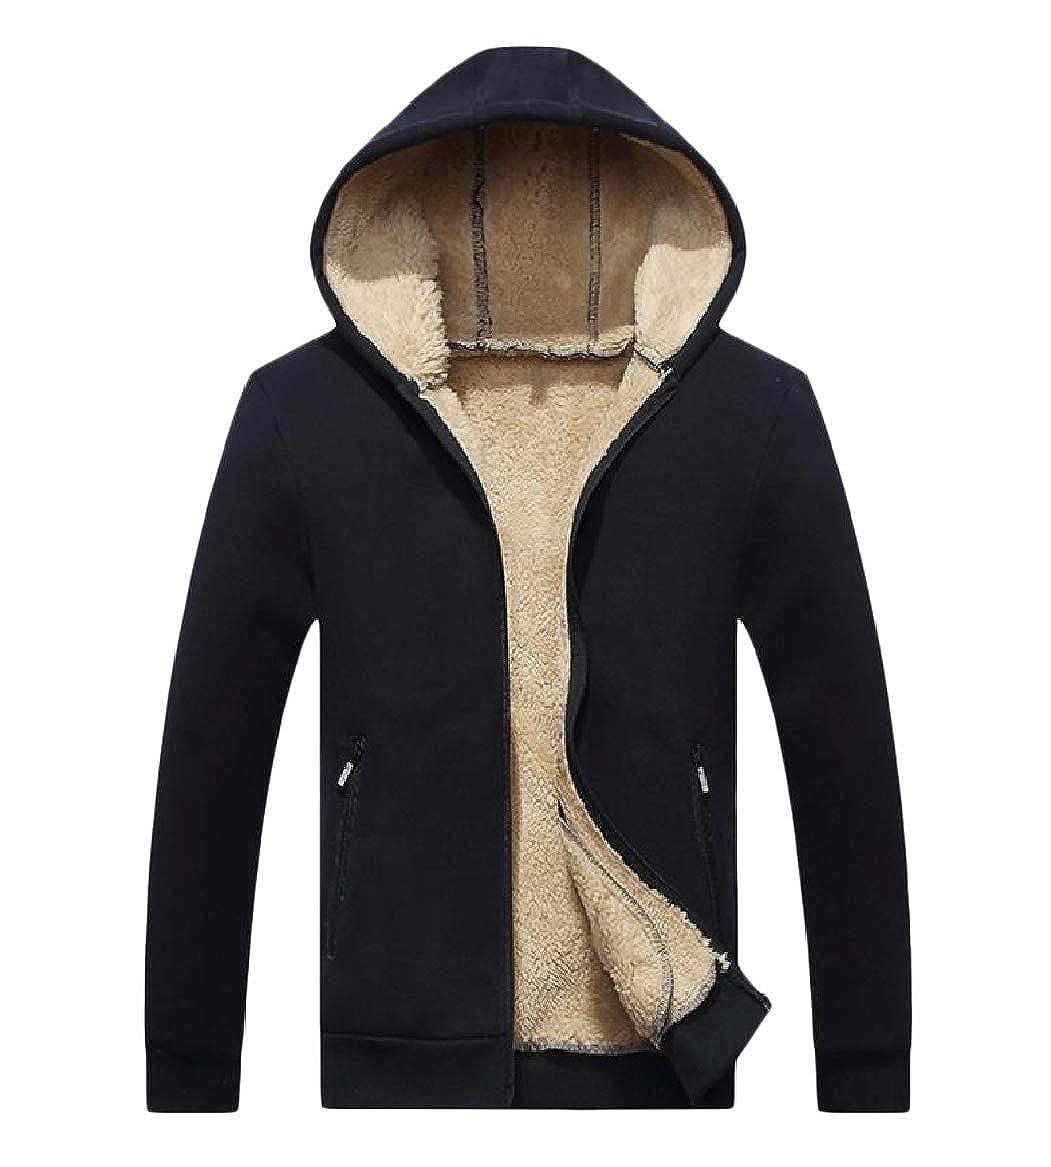 YUNY Mens Athletic Jogging Slim Fit Thickened Jacket Coat Sweatshirt Black S